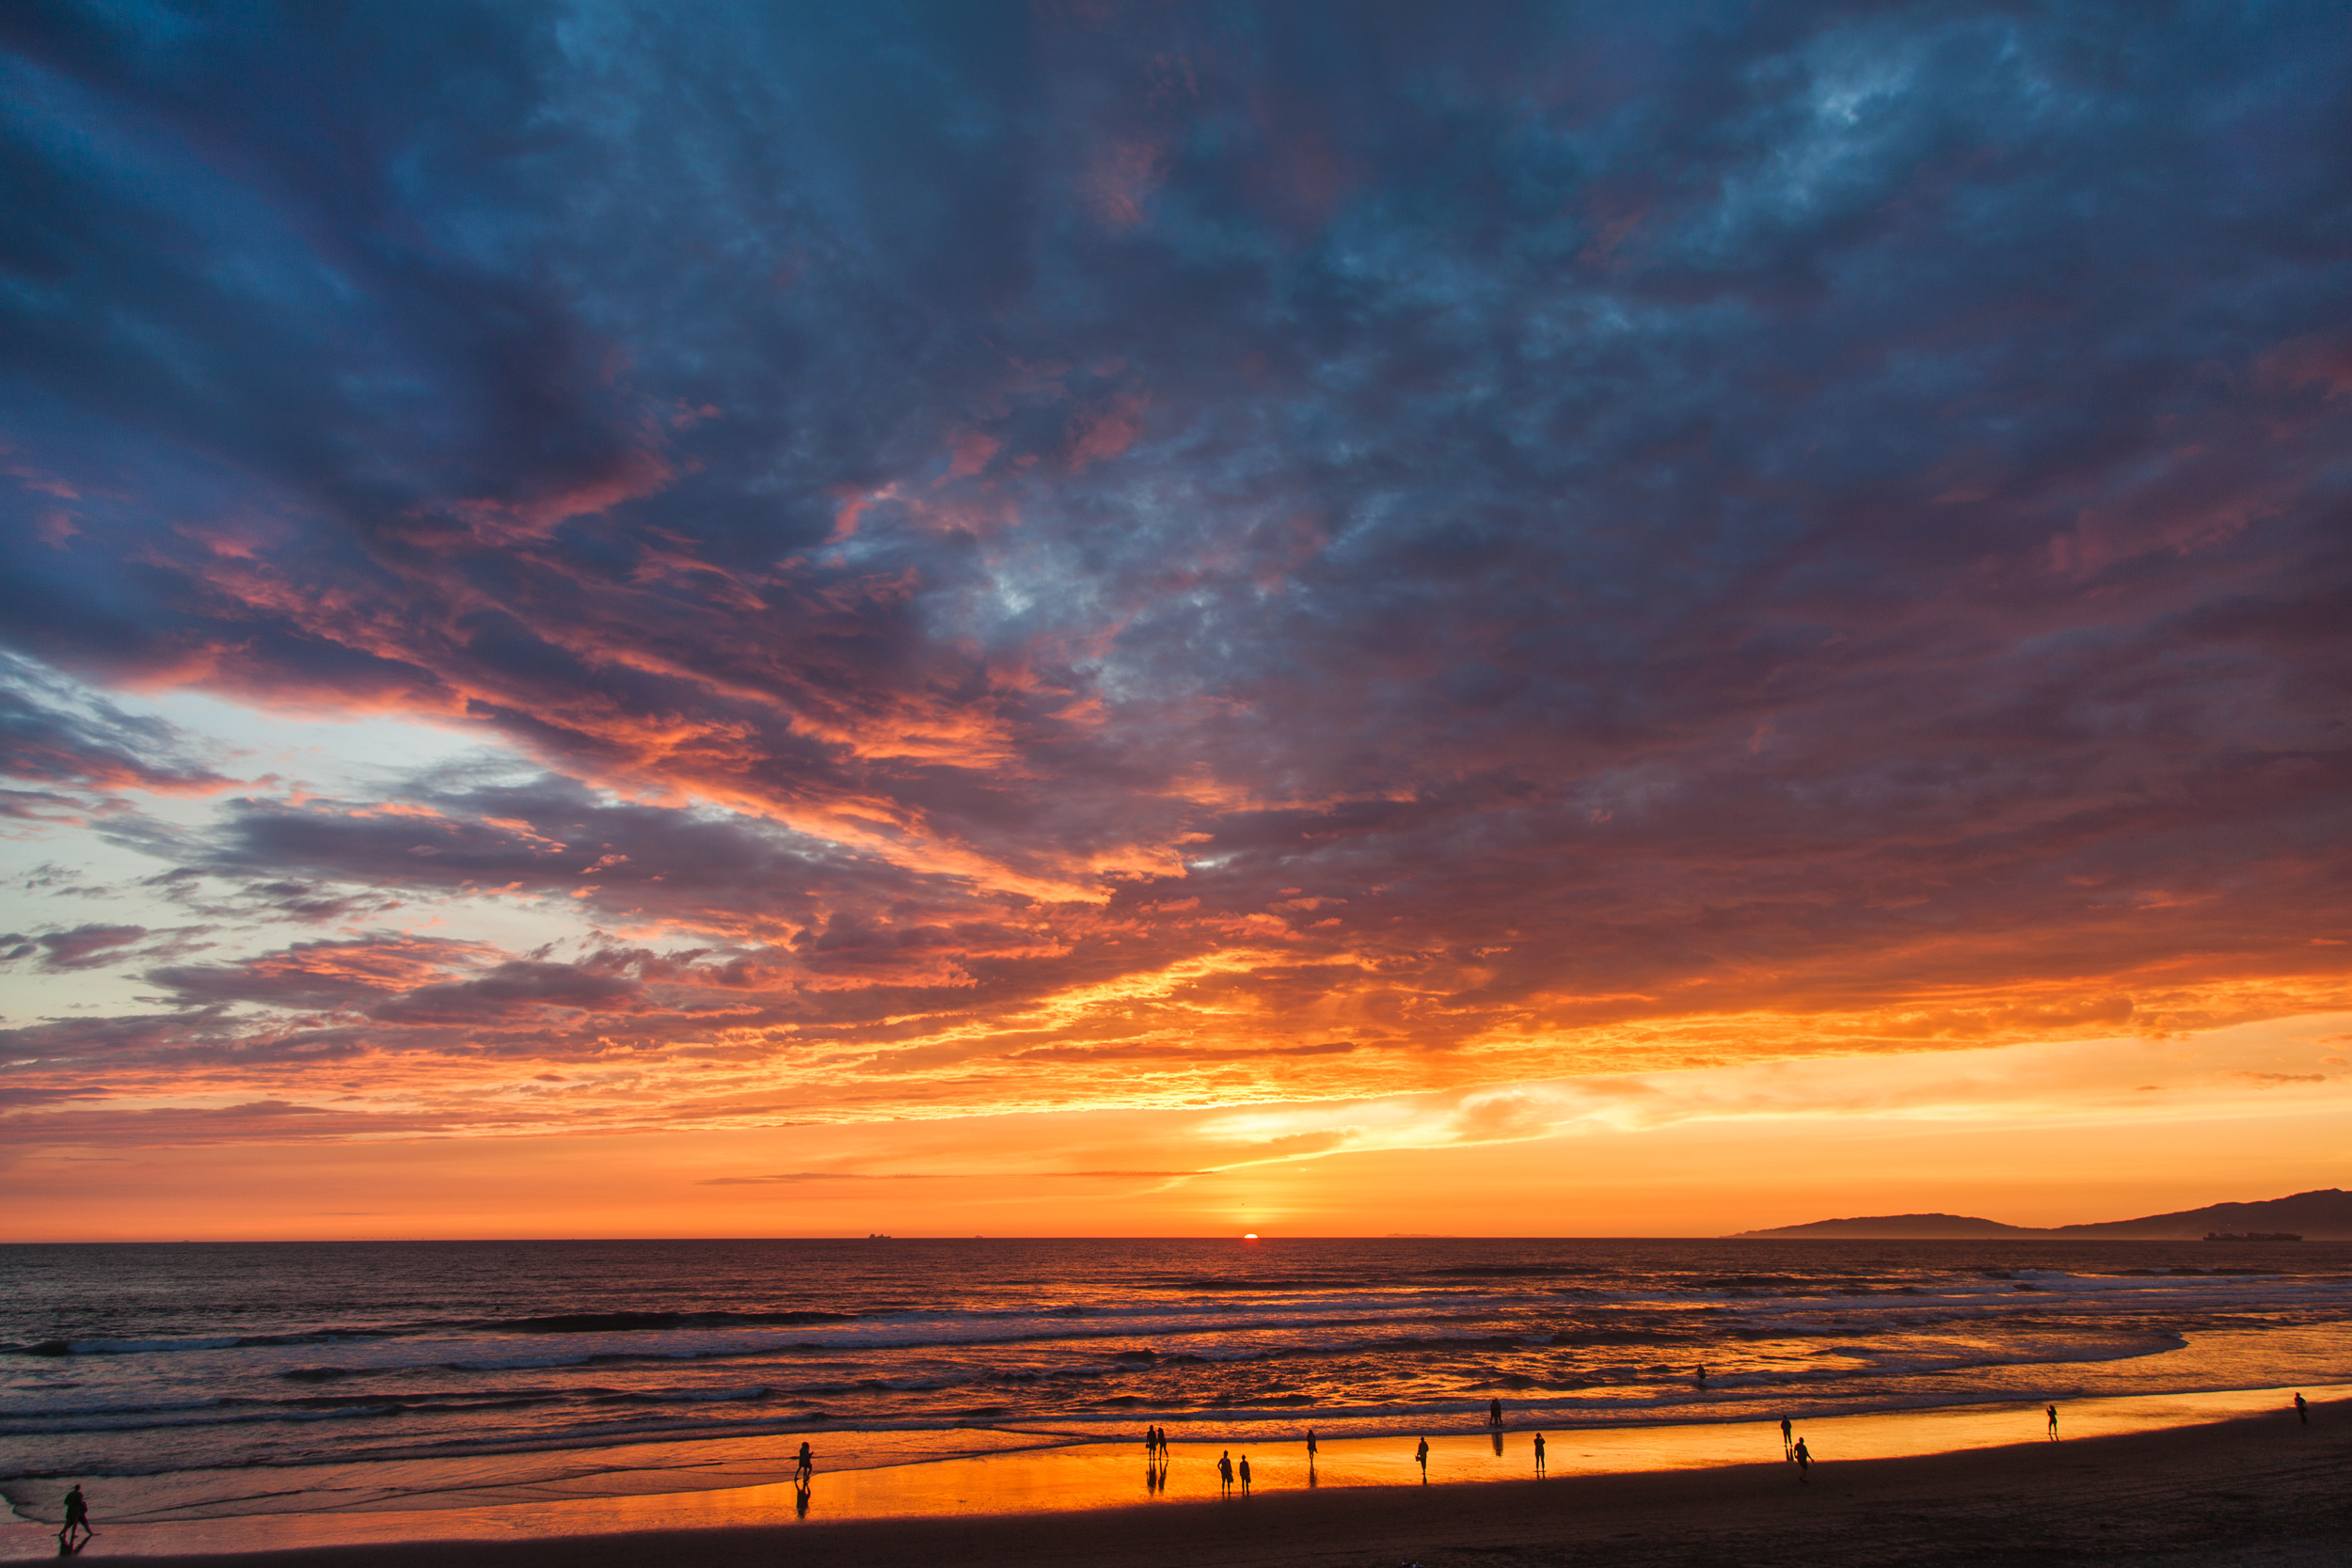 ocean beach sunset san francisco california.jpg